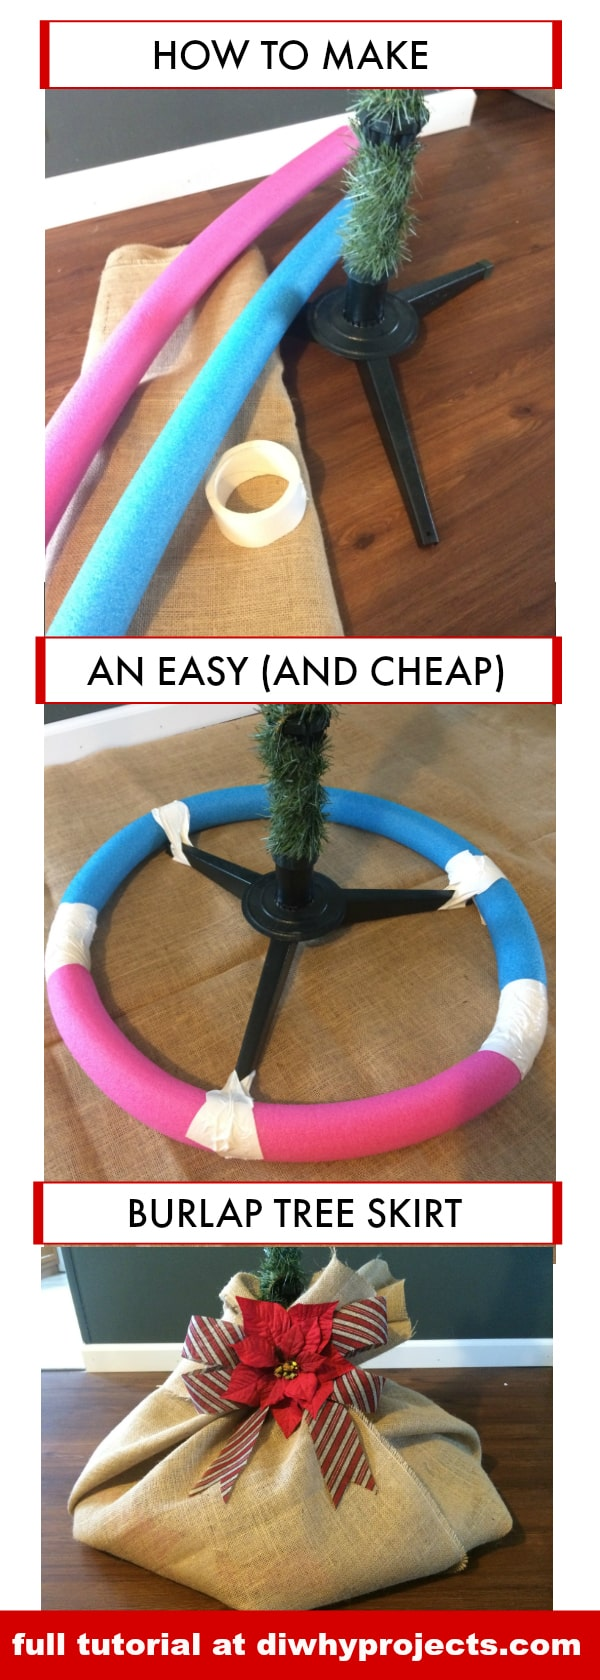 DIY Burlap Christmas Tree Skirt, Farmhouse Style, Rustic Christmas